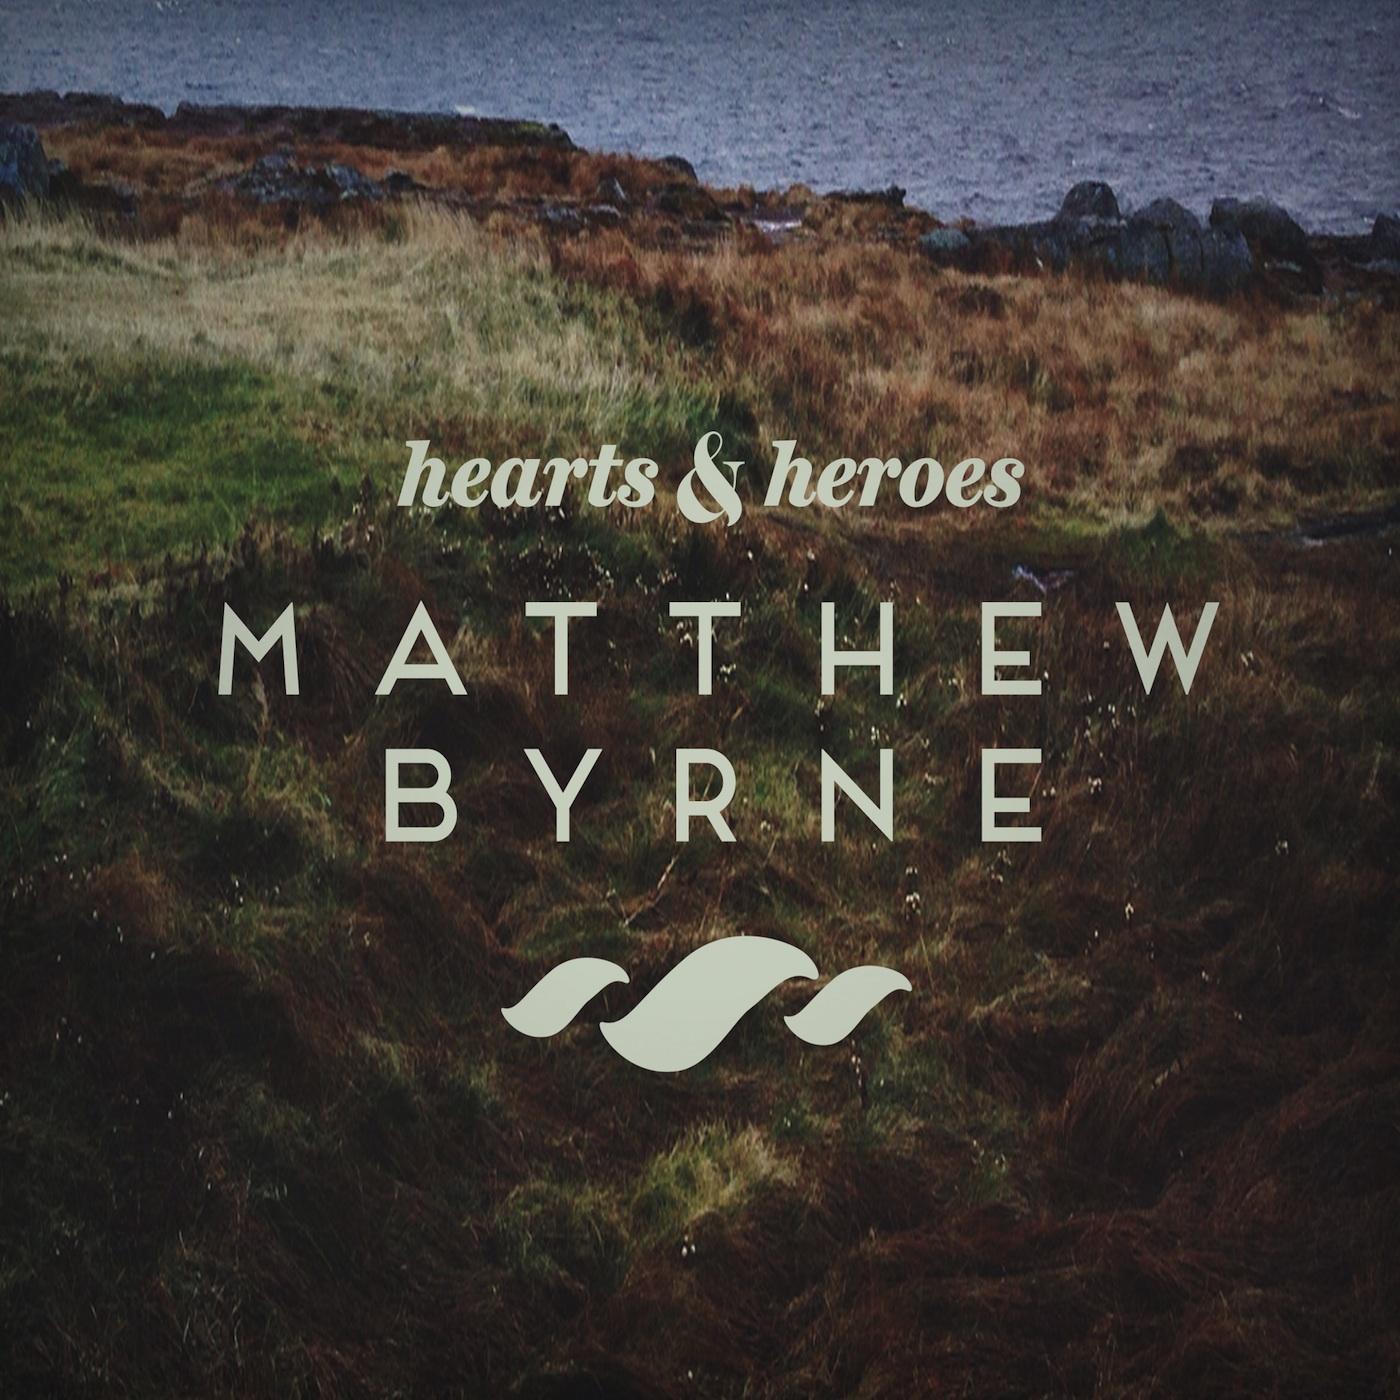 Hearts & Heroes (2014)